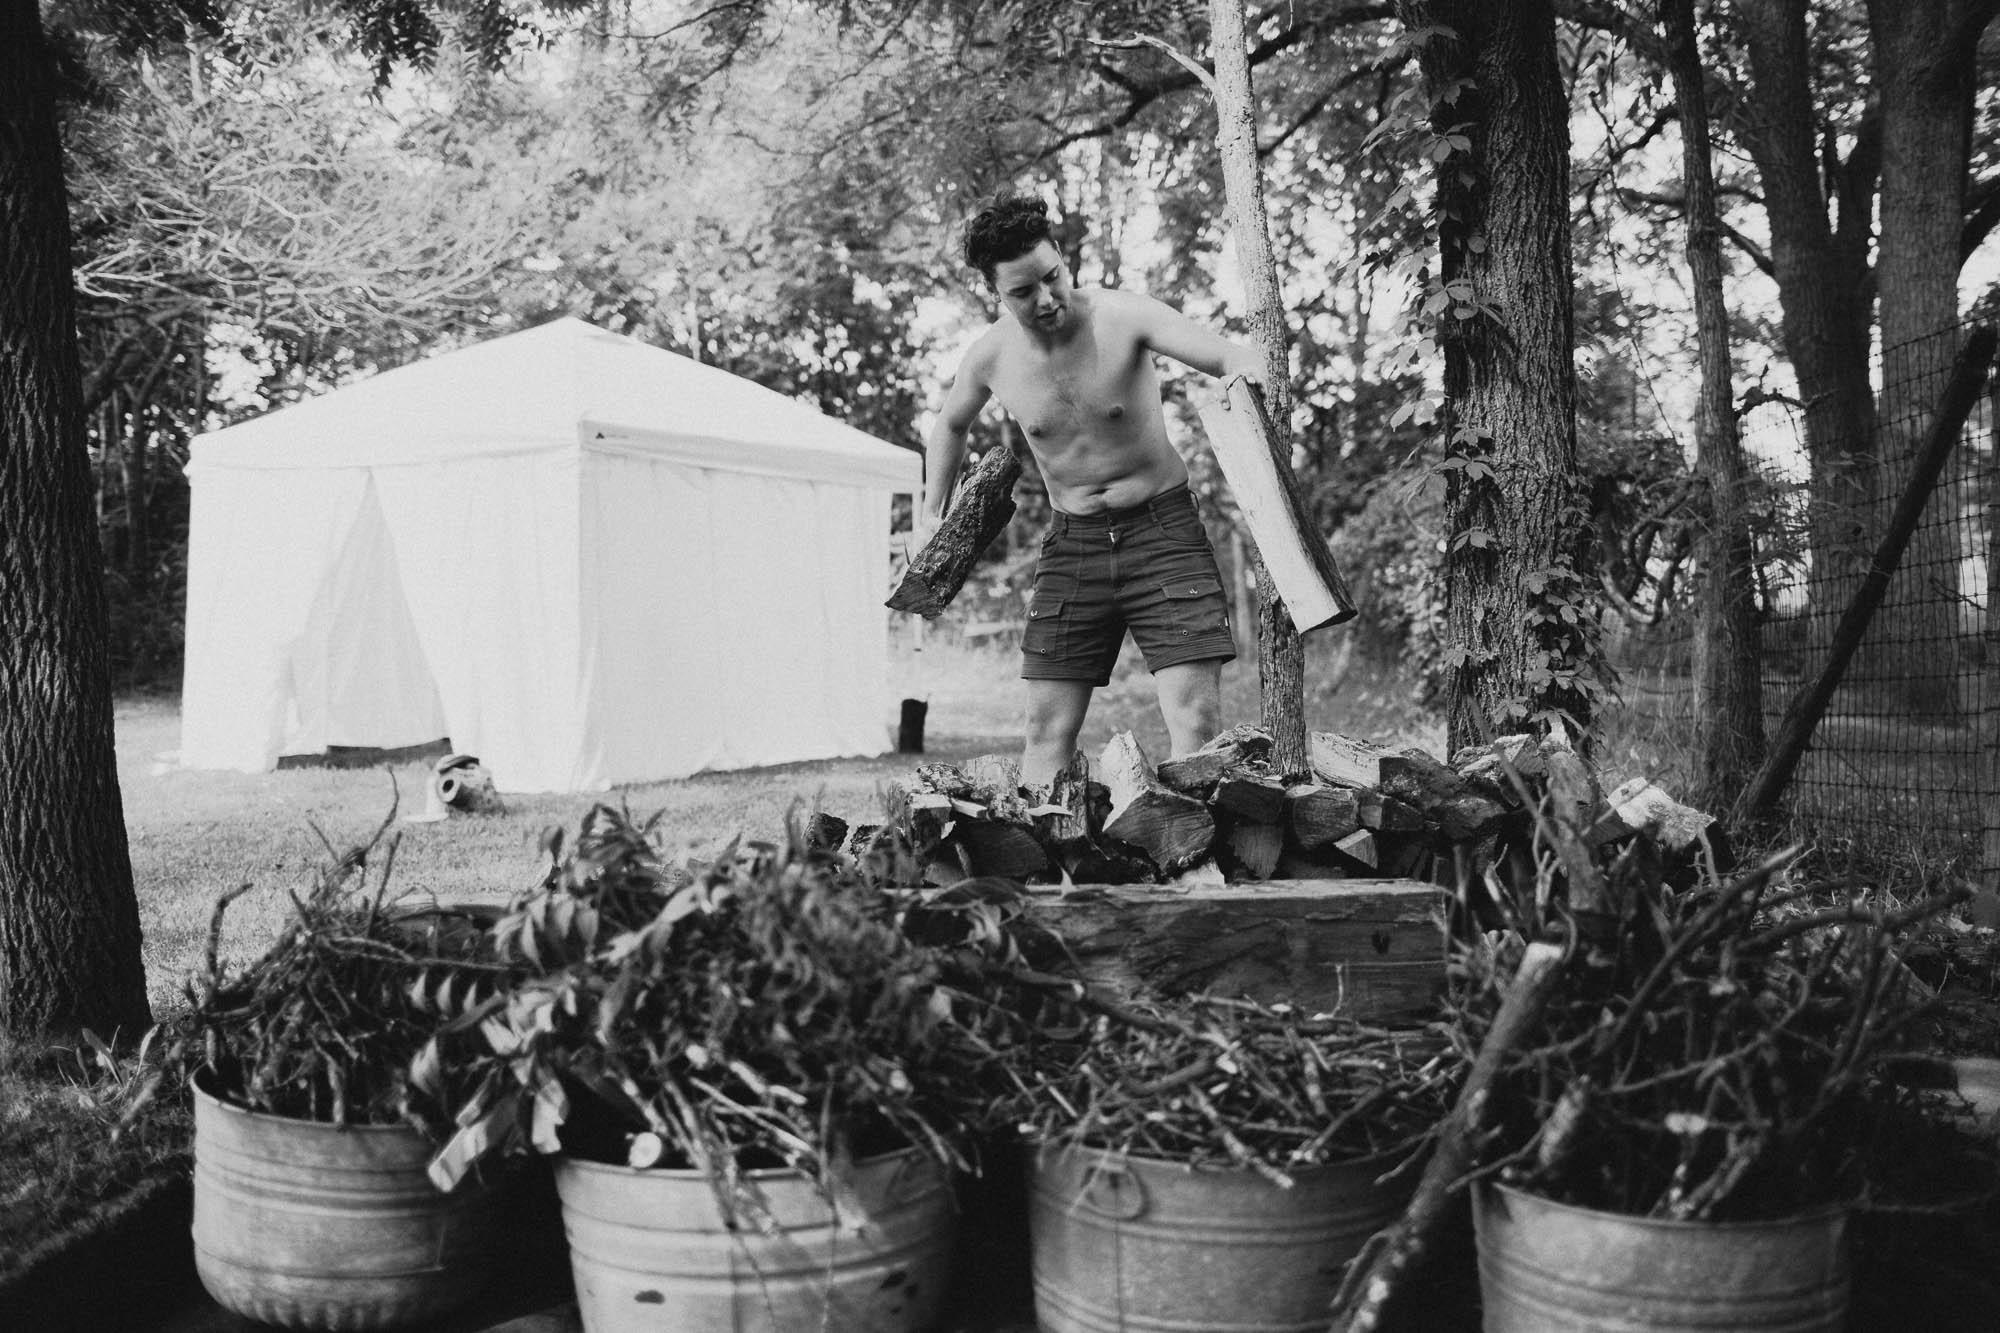 Leah-Graham-Michigan-Outdoor-DIY-Wedding-012@2x.jpg